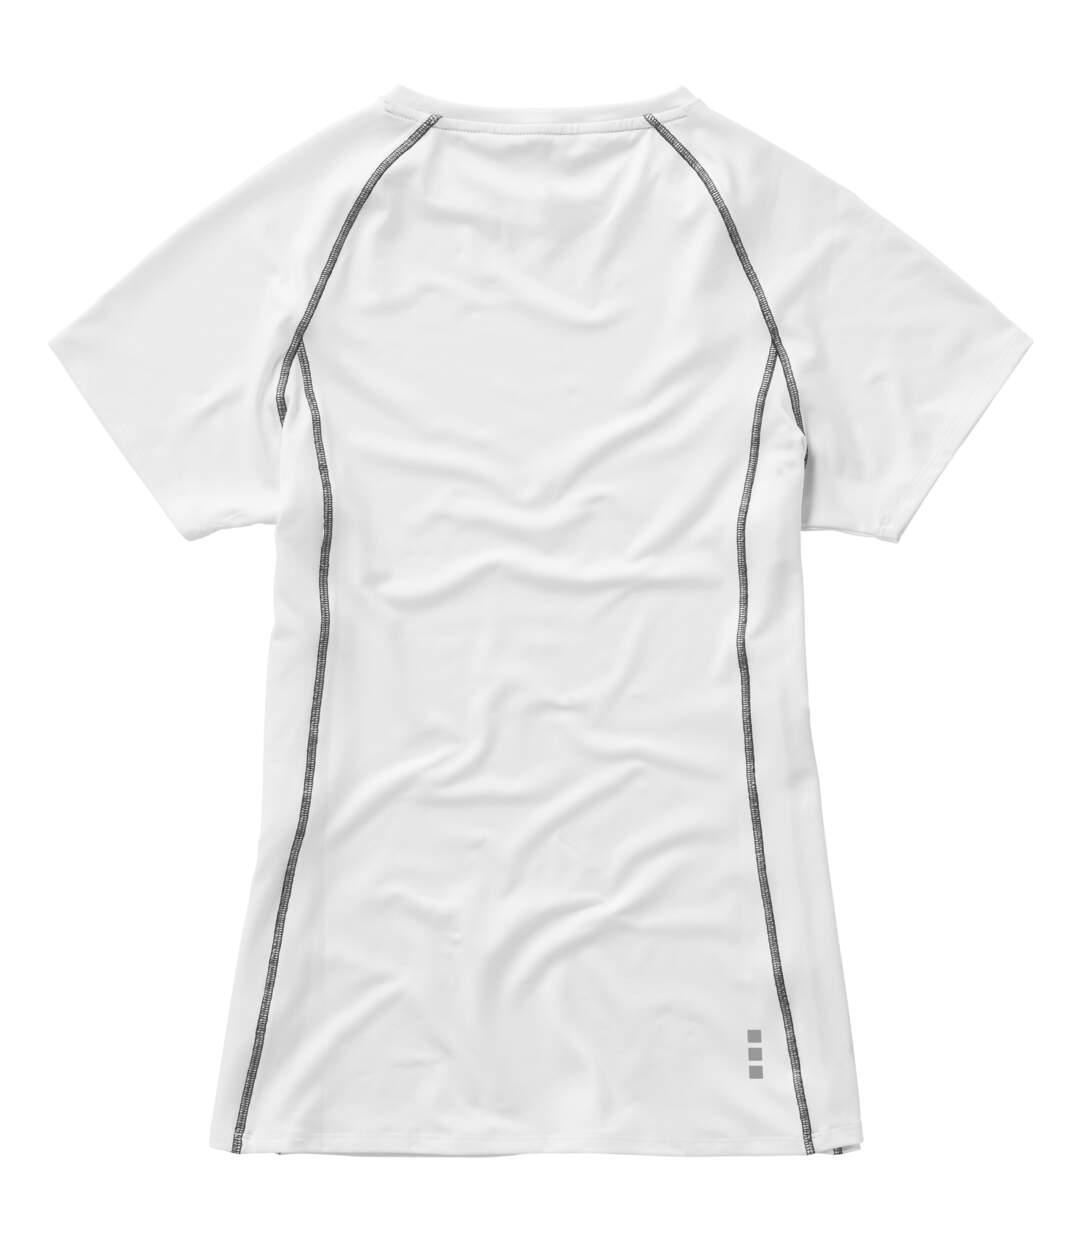 Elevate - T-Shirt Manches Courtes Kingston - Femme (Blanc) - UTPF1881